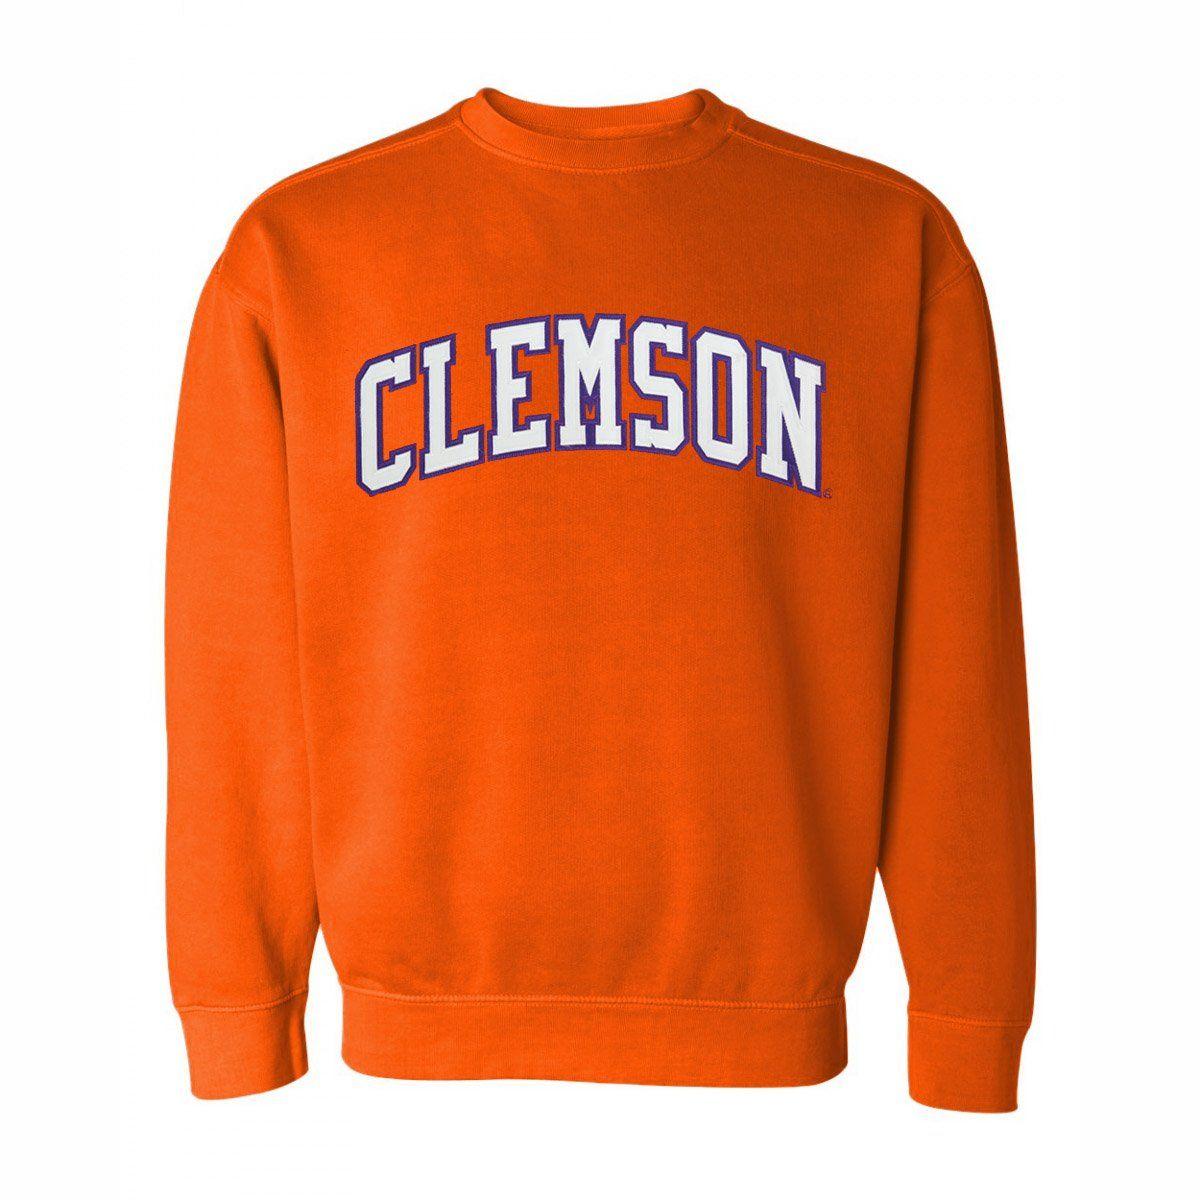 2 Color Tackle Twill Sweatshirt Multiple Colors Sweatshirts Orange Sweatshirts Purple Sweatshirt [ 1200 x 1200 Pixel ]